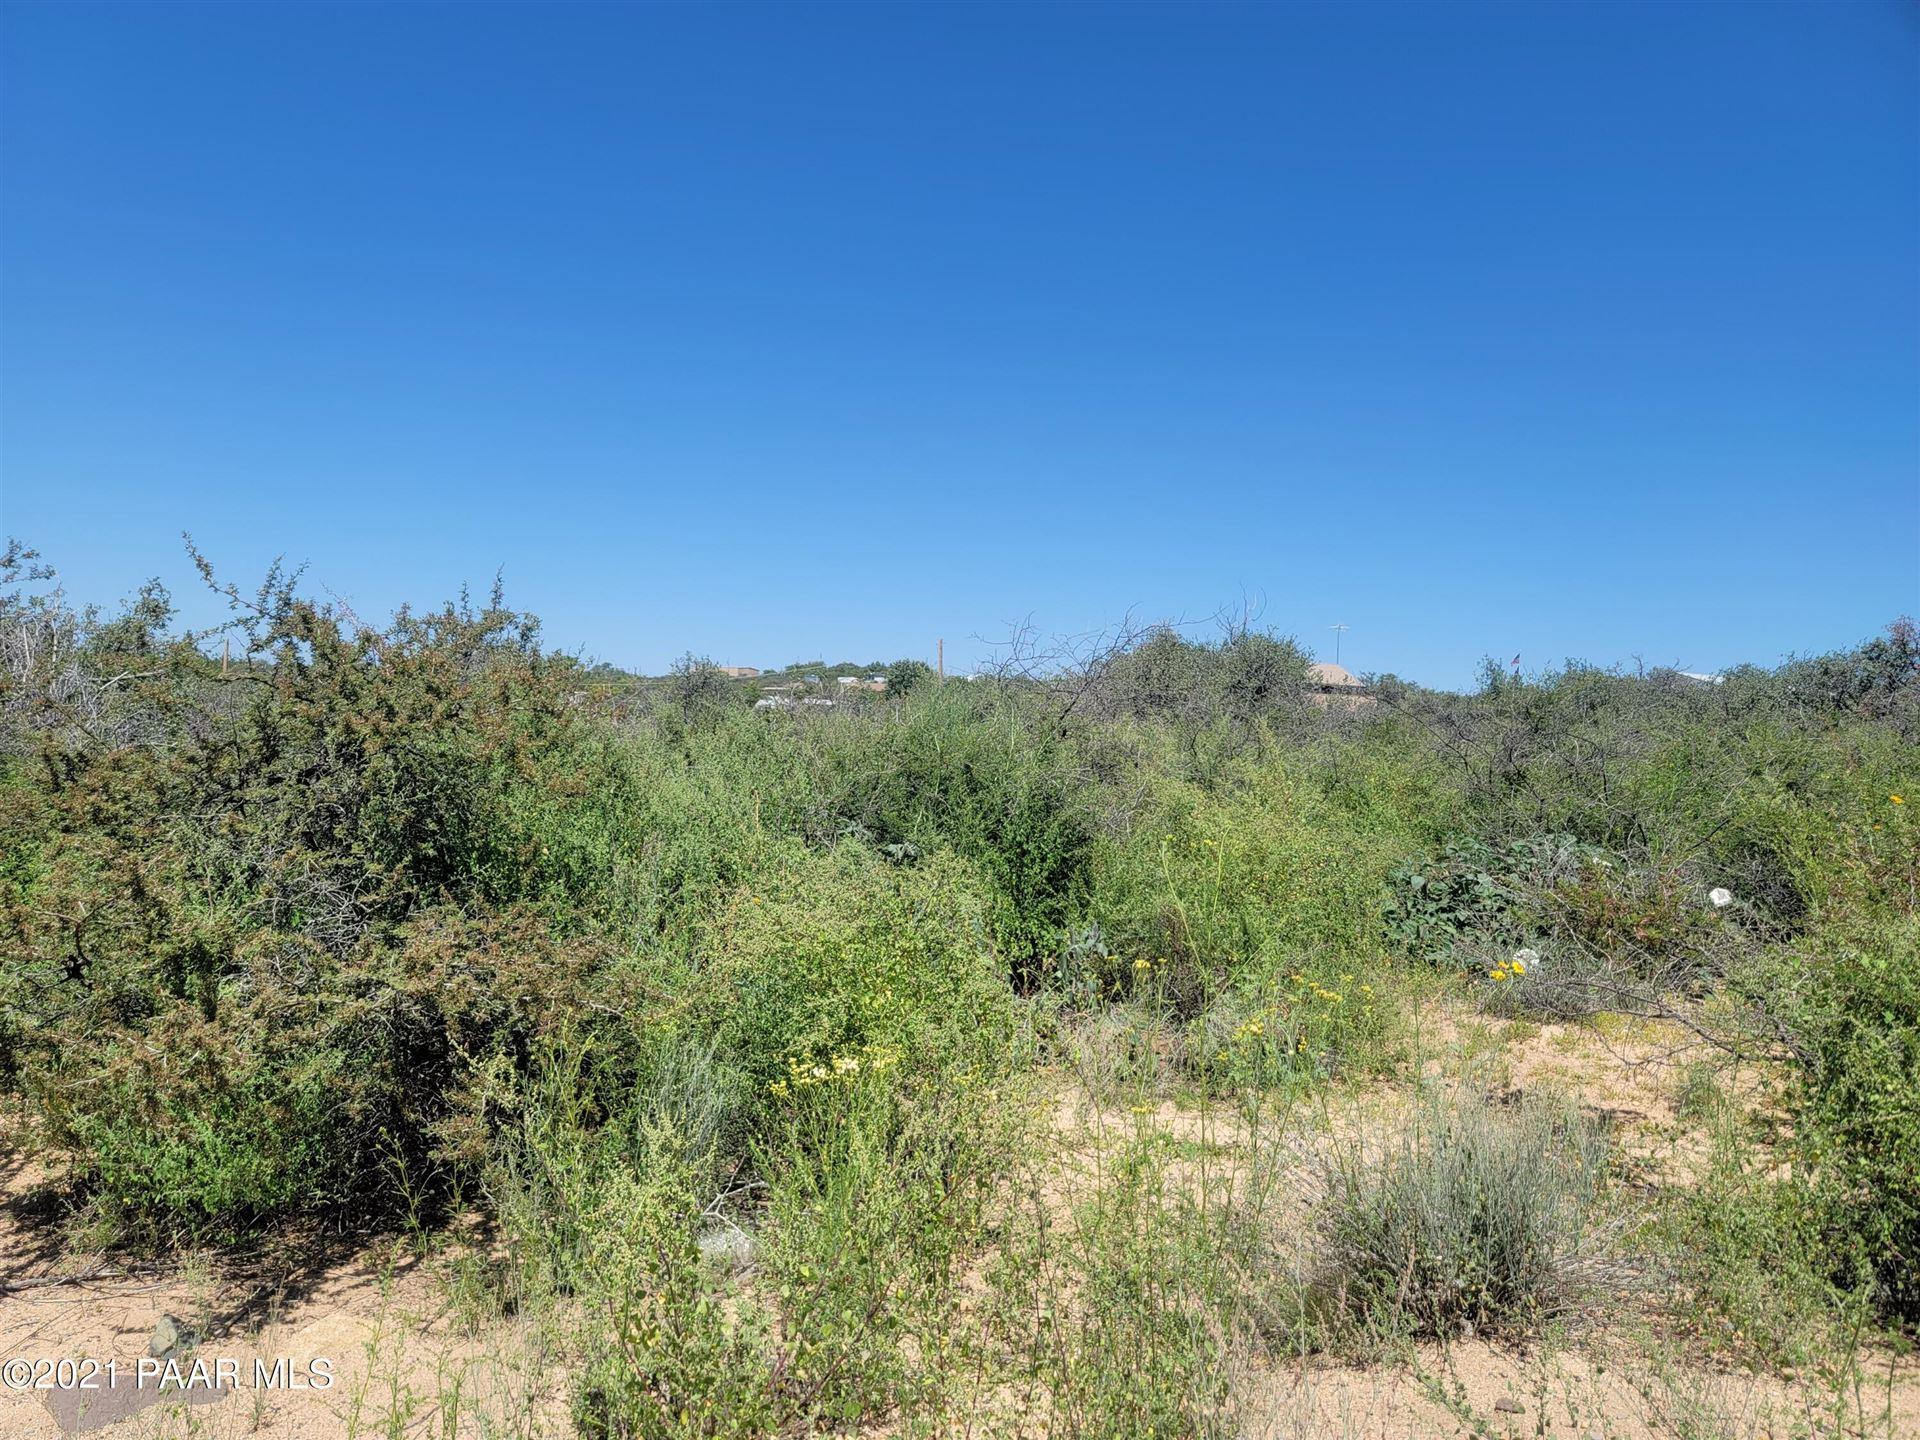 Photo of 9315 S Donald Trail #Lot: 62, Kirkland, AZ 86332 (MLS # 1037662)